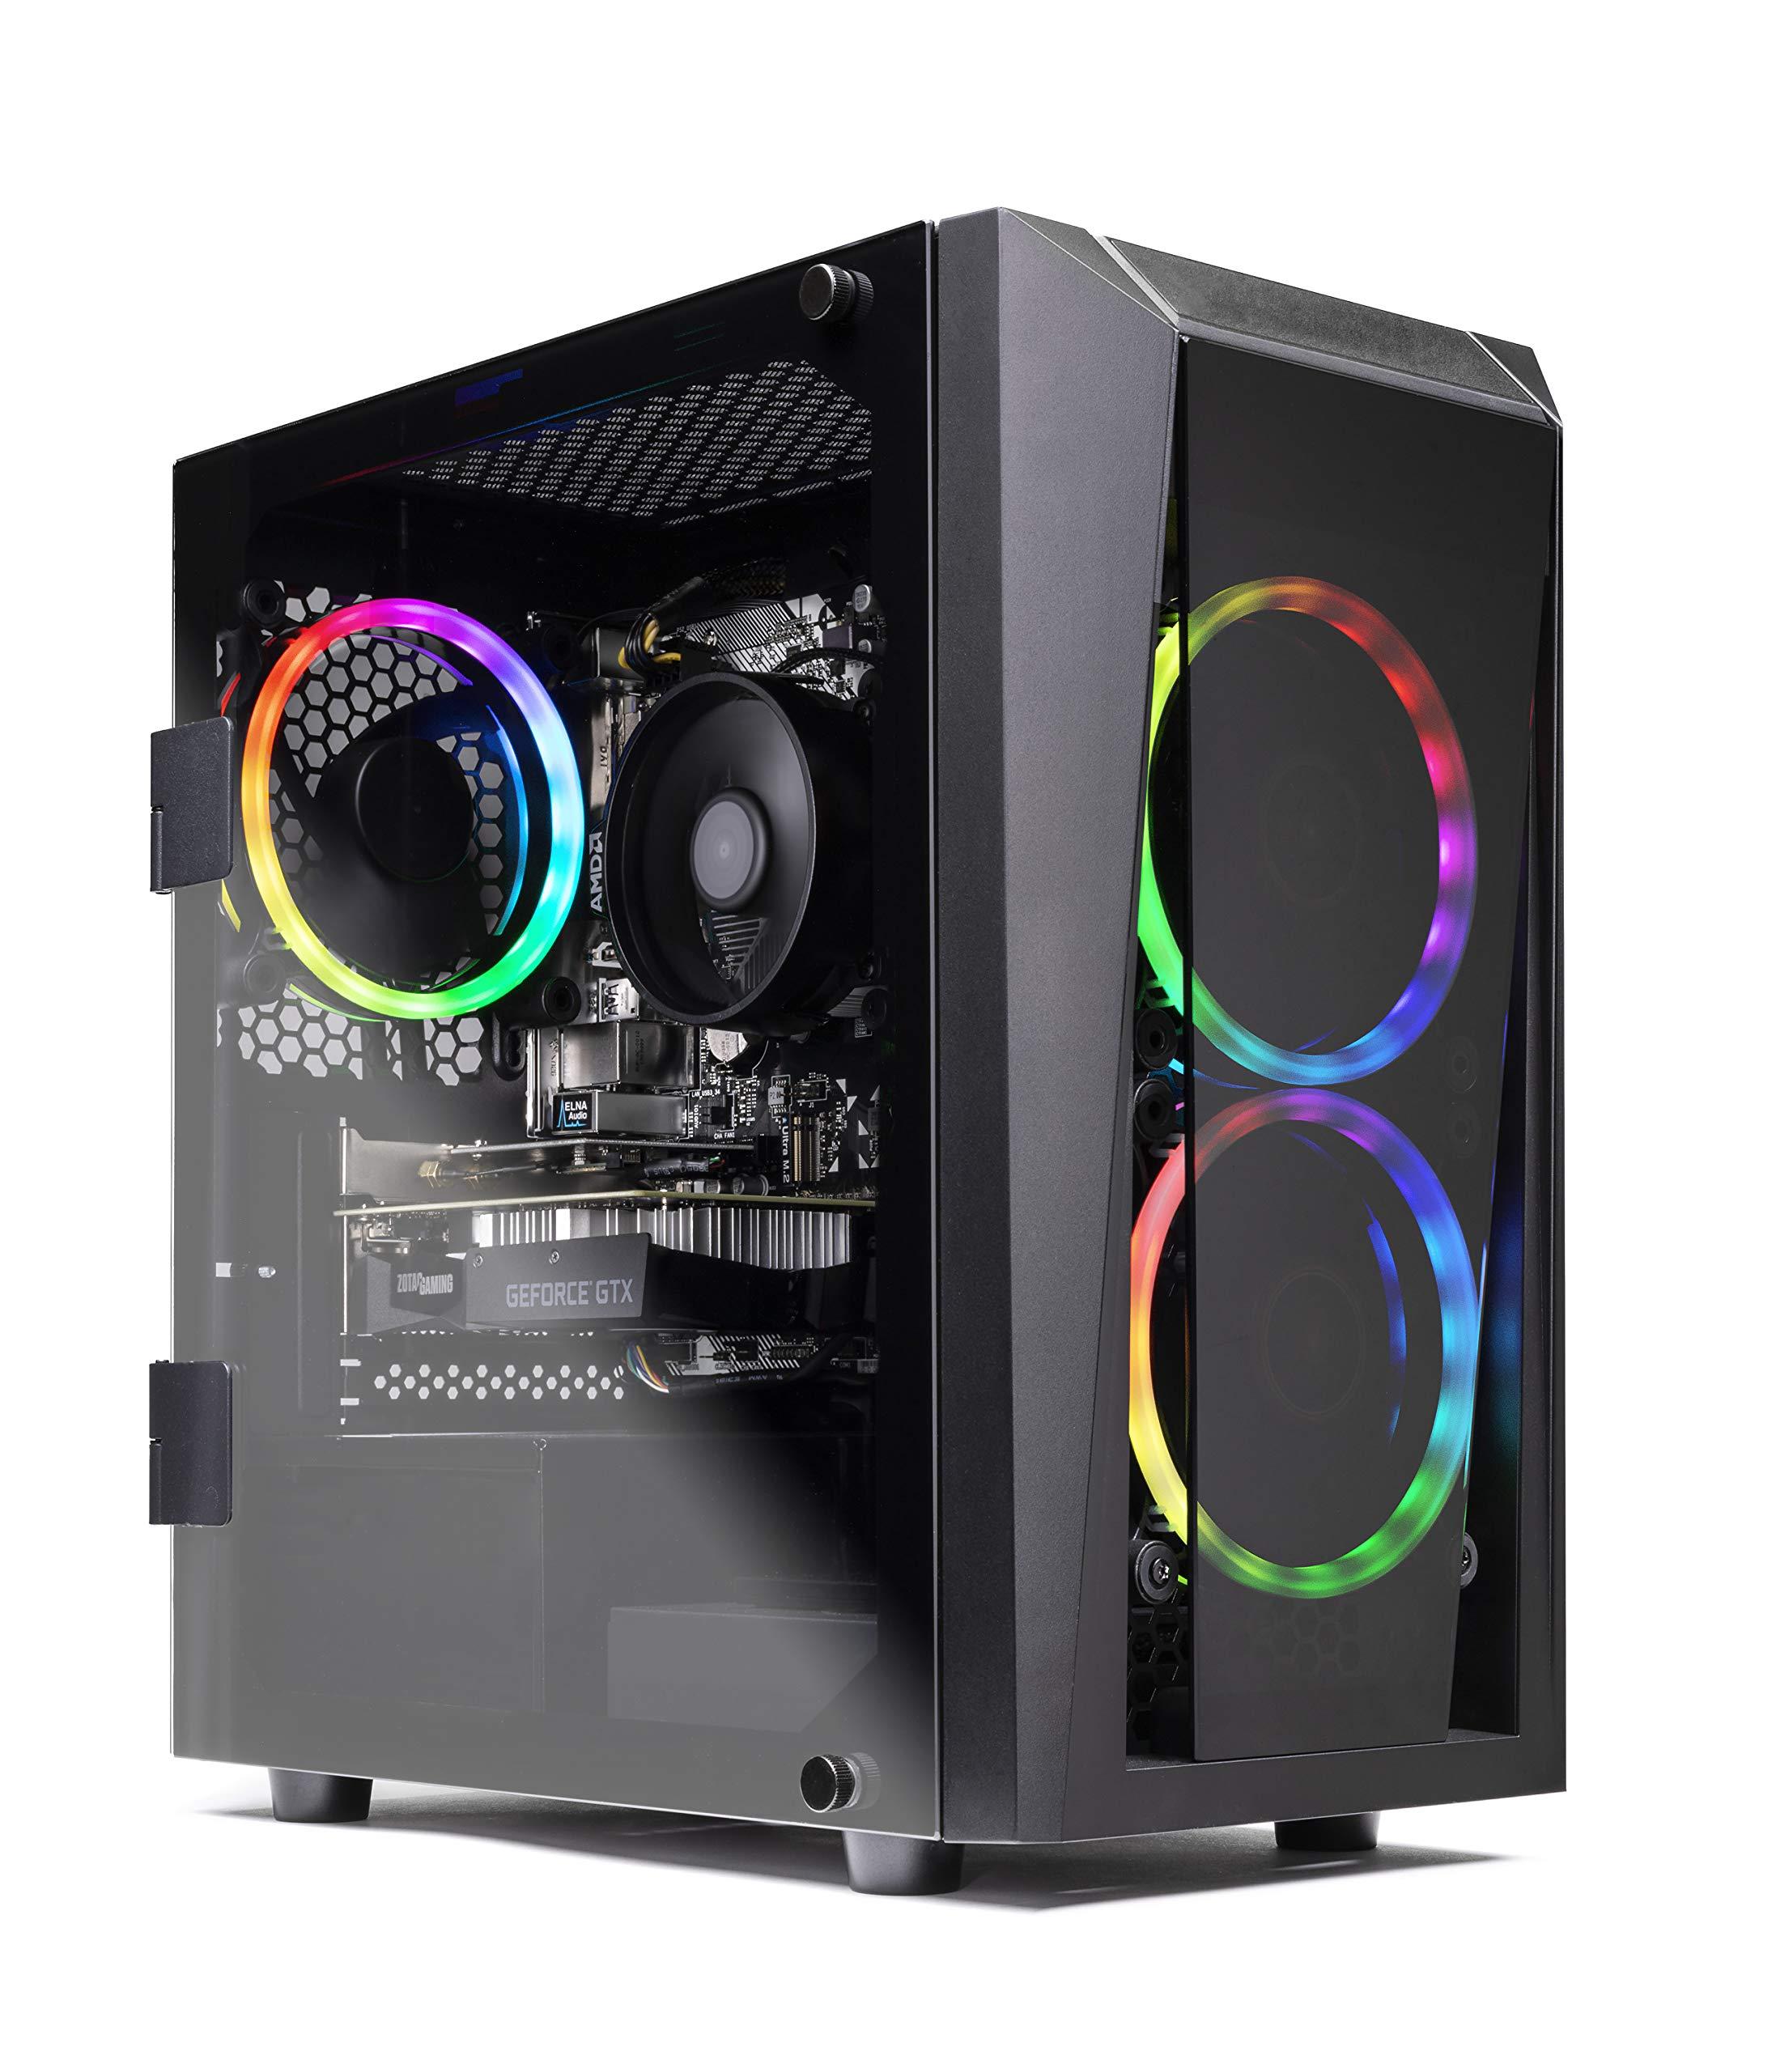 SkyTech Blaze II Gaming Computer PC Desktop - Ryzen 5 2600 6-Core 3.4 GHz, NVIDIA GeForce GTX 1660 TI 6G, 500G SSD, 8GB DDR4, RGB, AC WiFi, Windows 10 Home 64-bit by Skytech Gaming